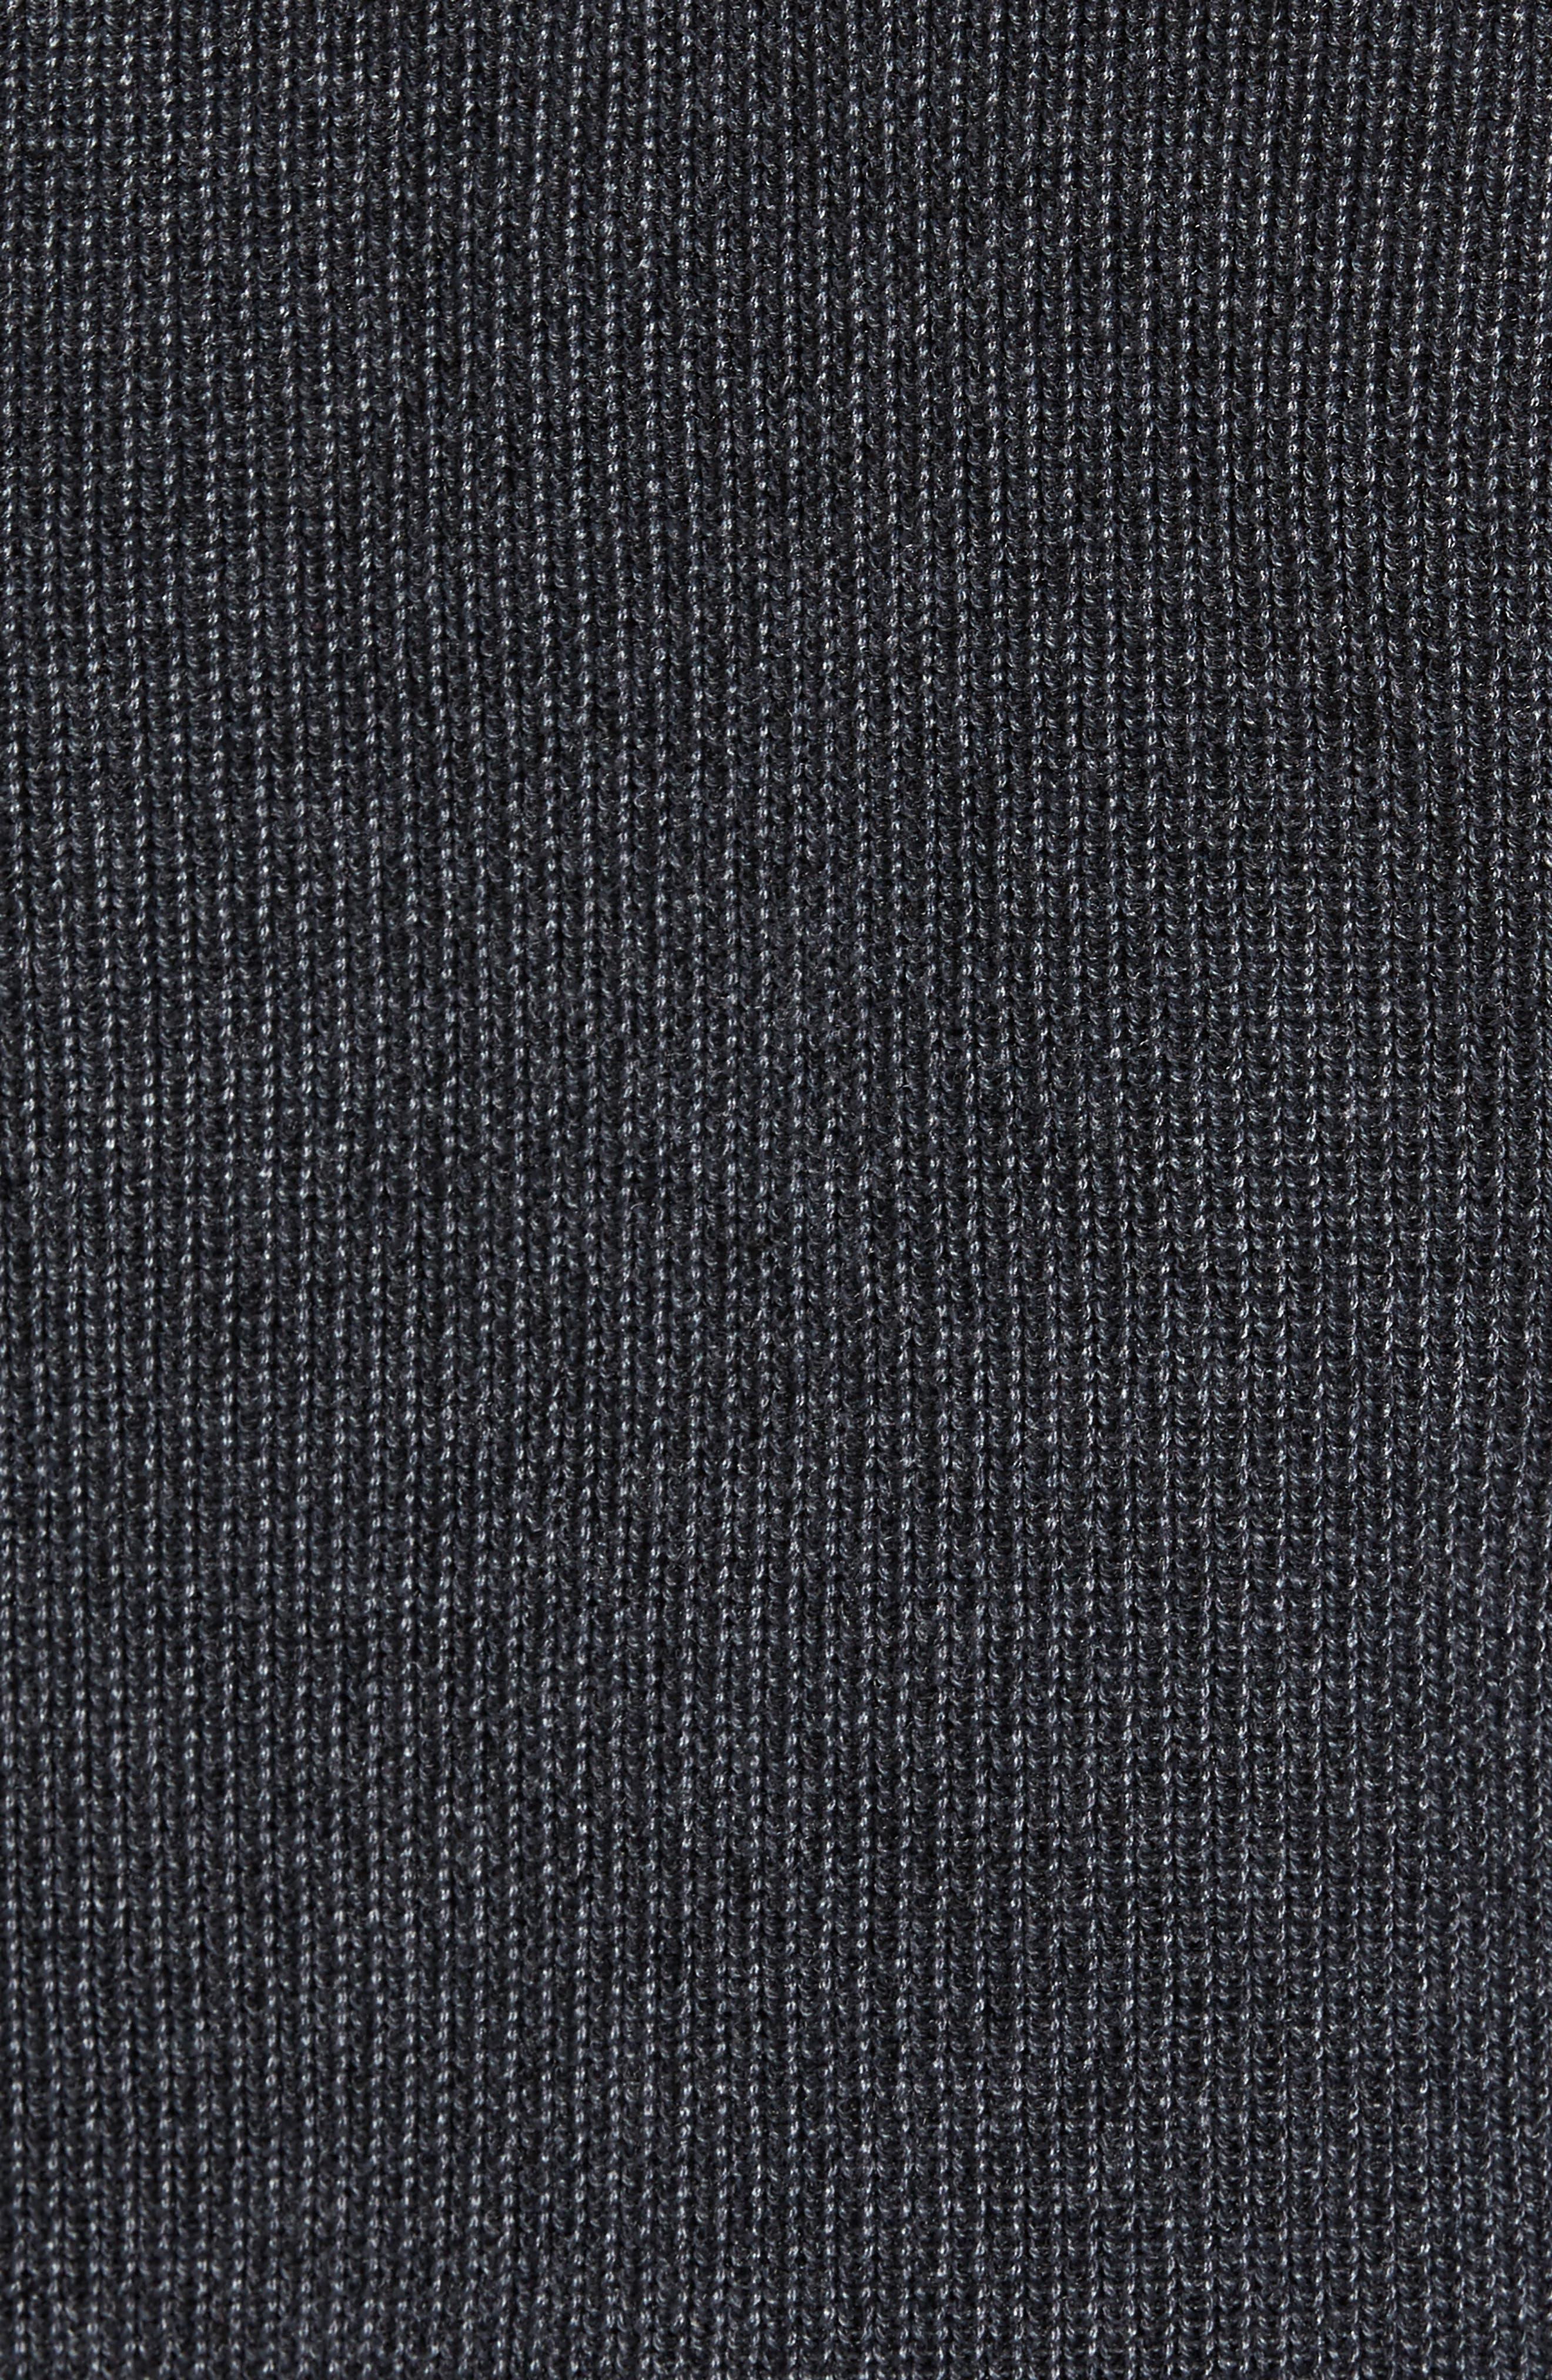 Stach Quarter Zip Sweater,                             Alternate thumbnail 5, color,                             010